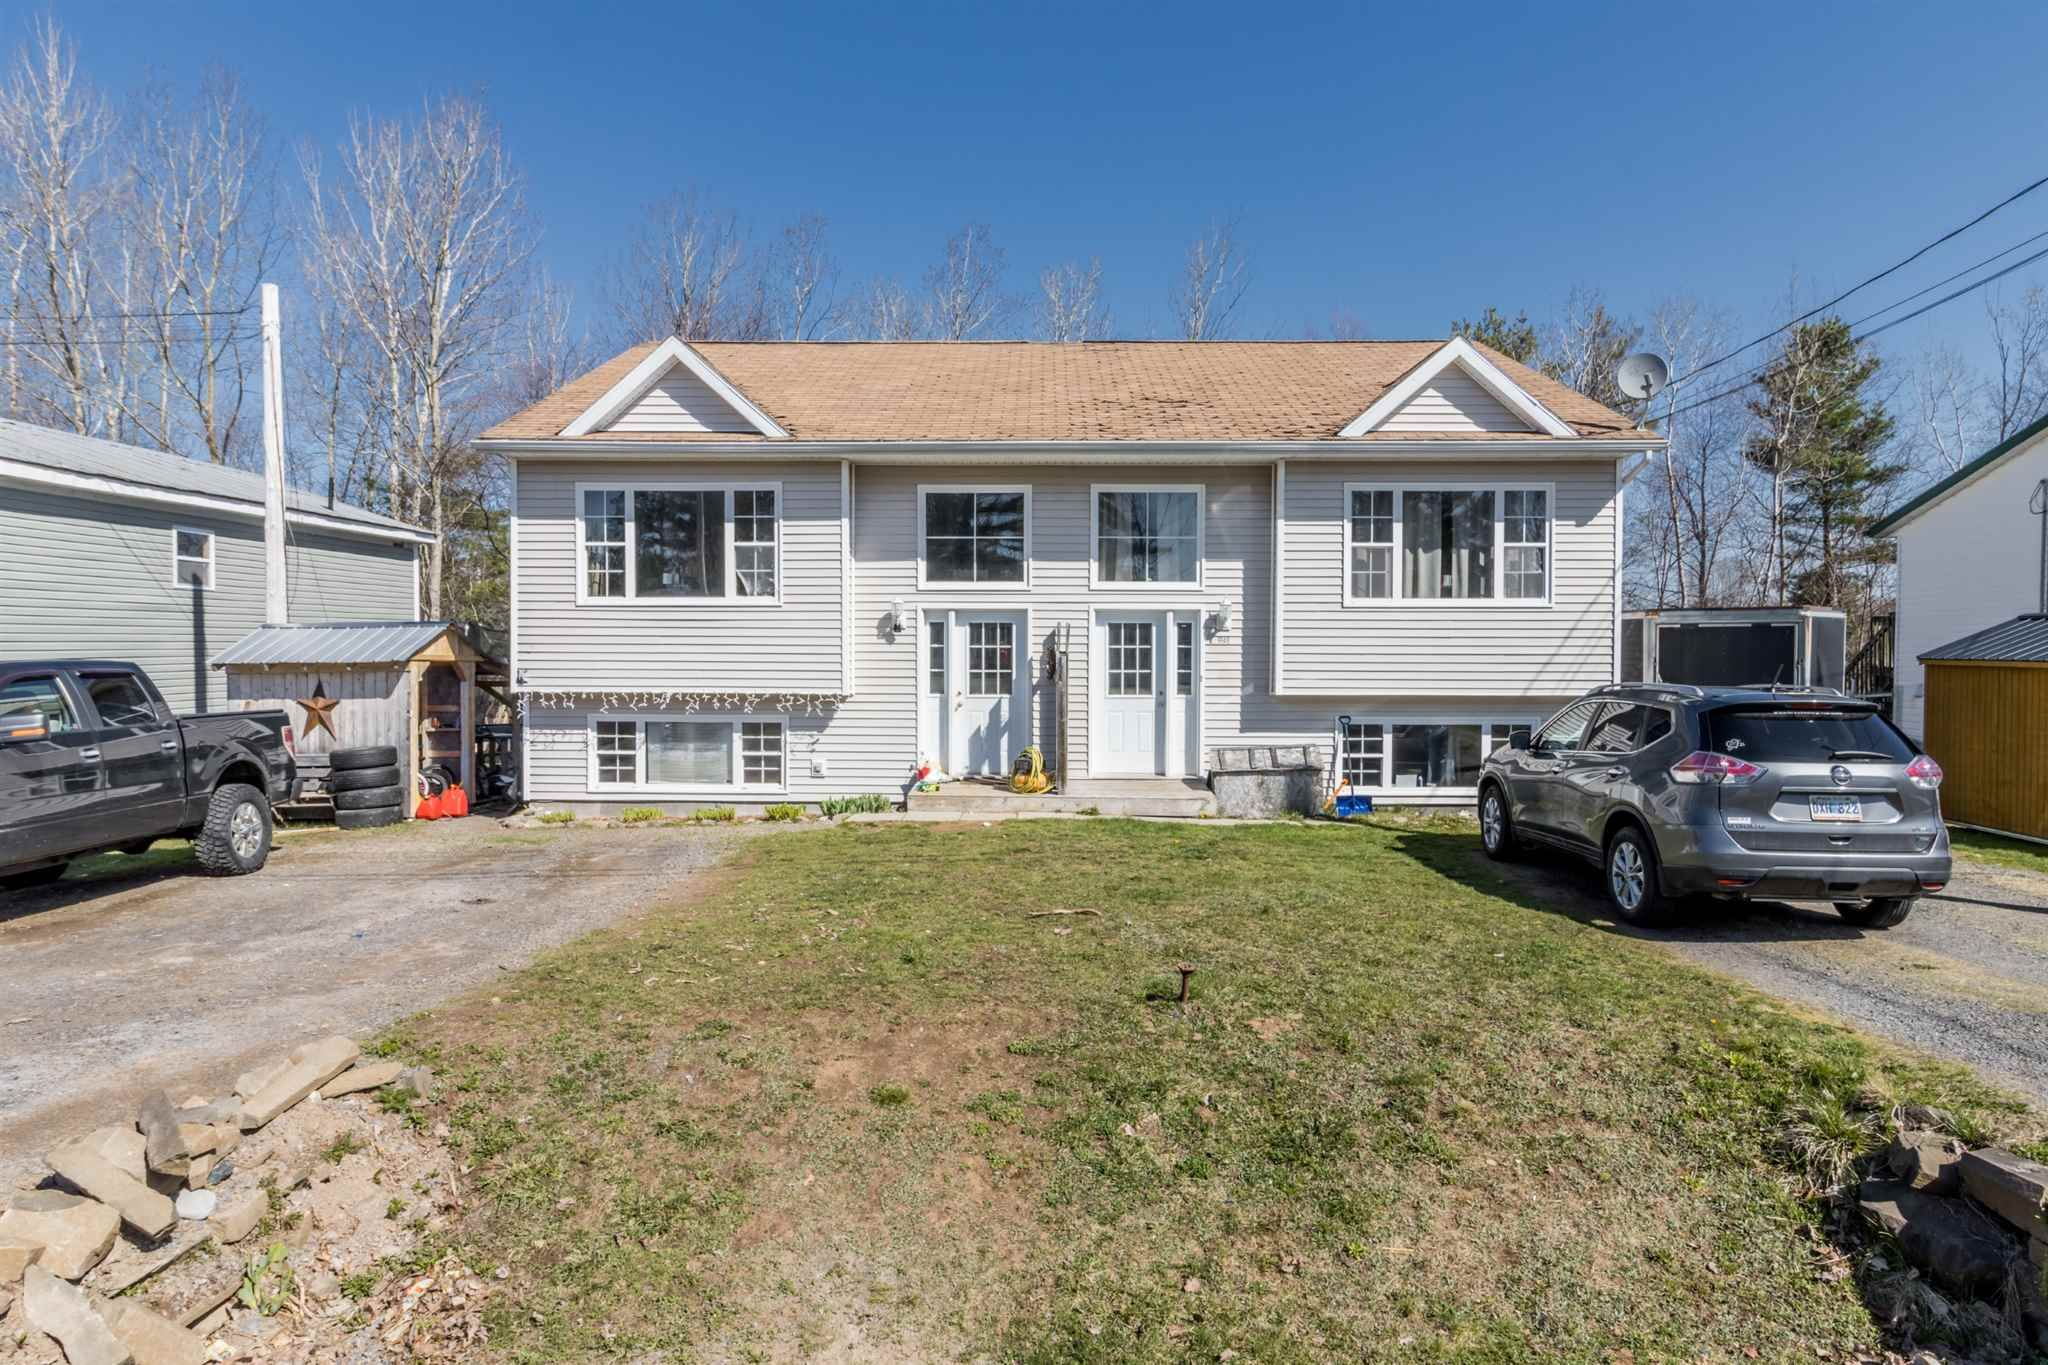 Main Photo: 992 & 994 Dakota Lane in Greenwood: 404-Kings County Multi-Family for sale (Annapolis Valley)  : MLS®# 202109476